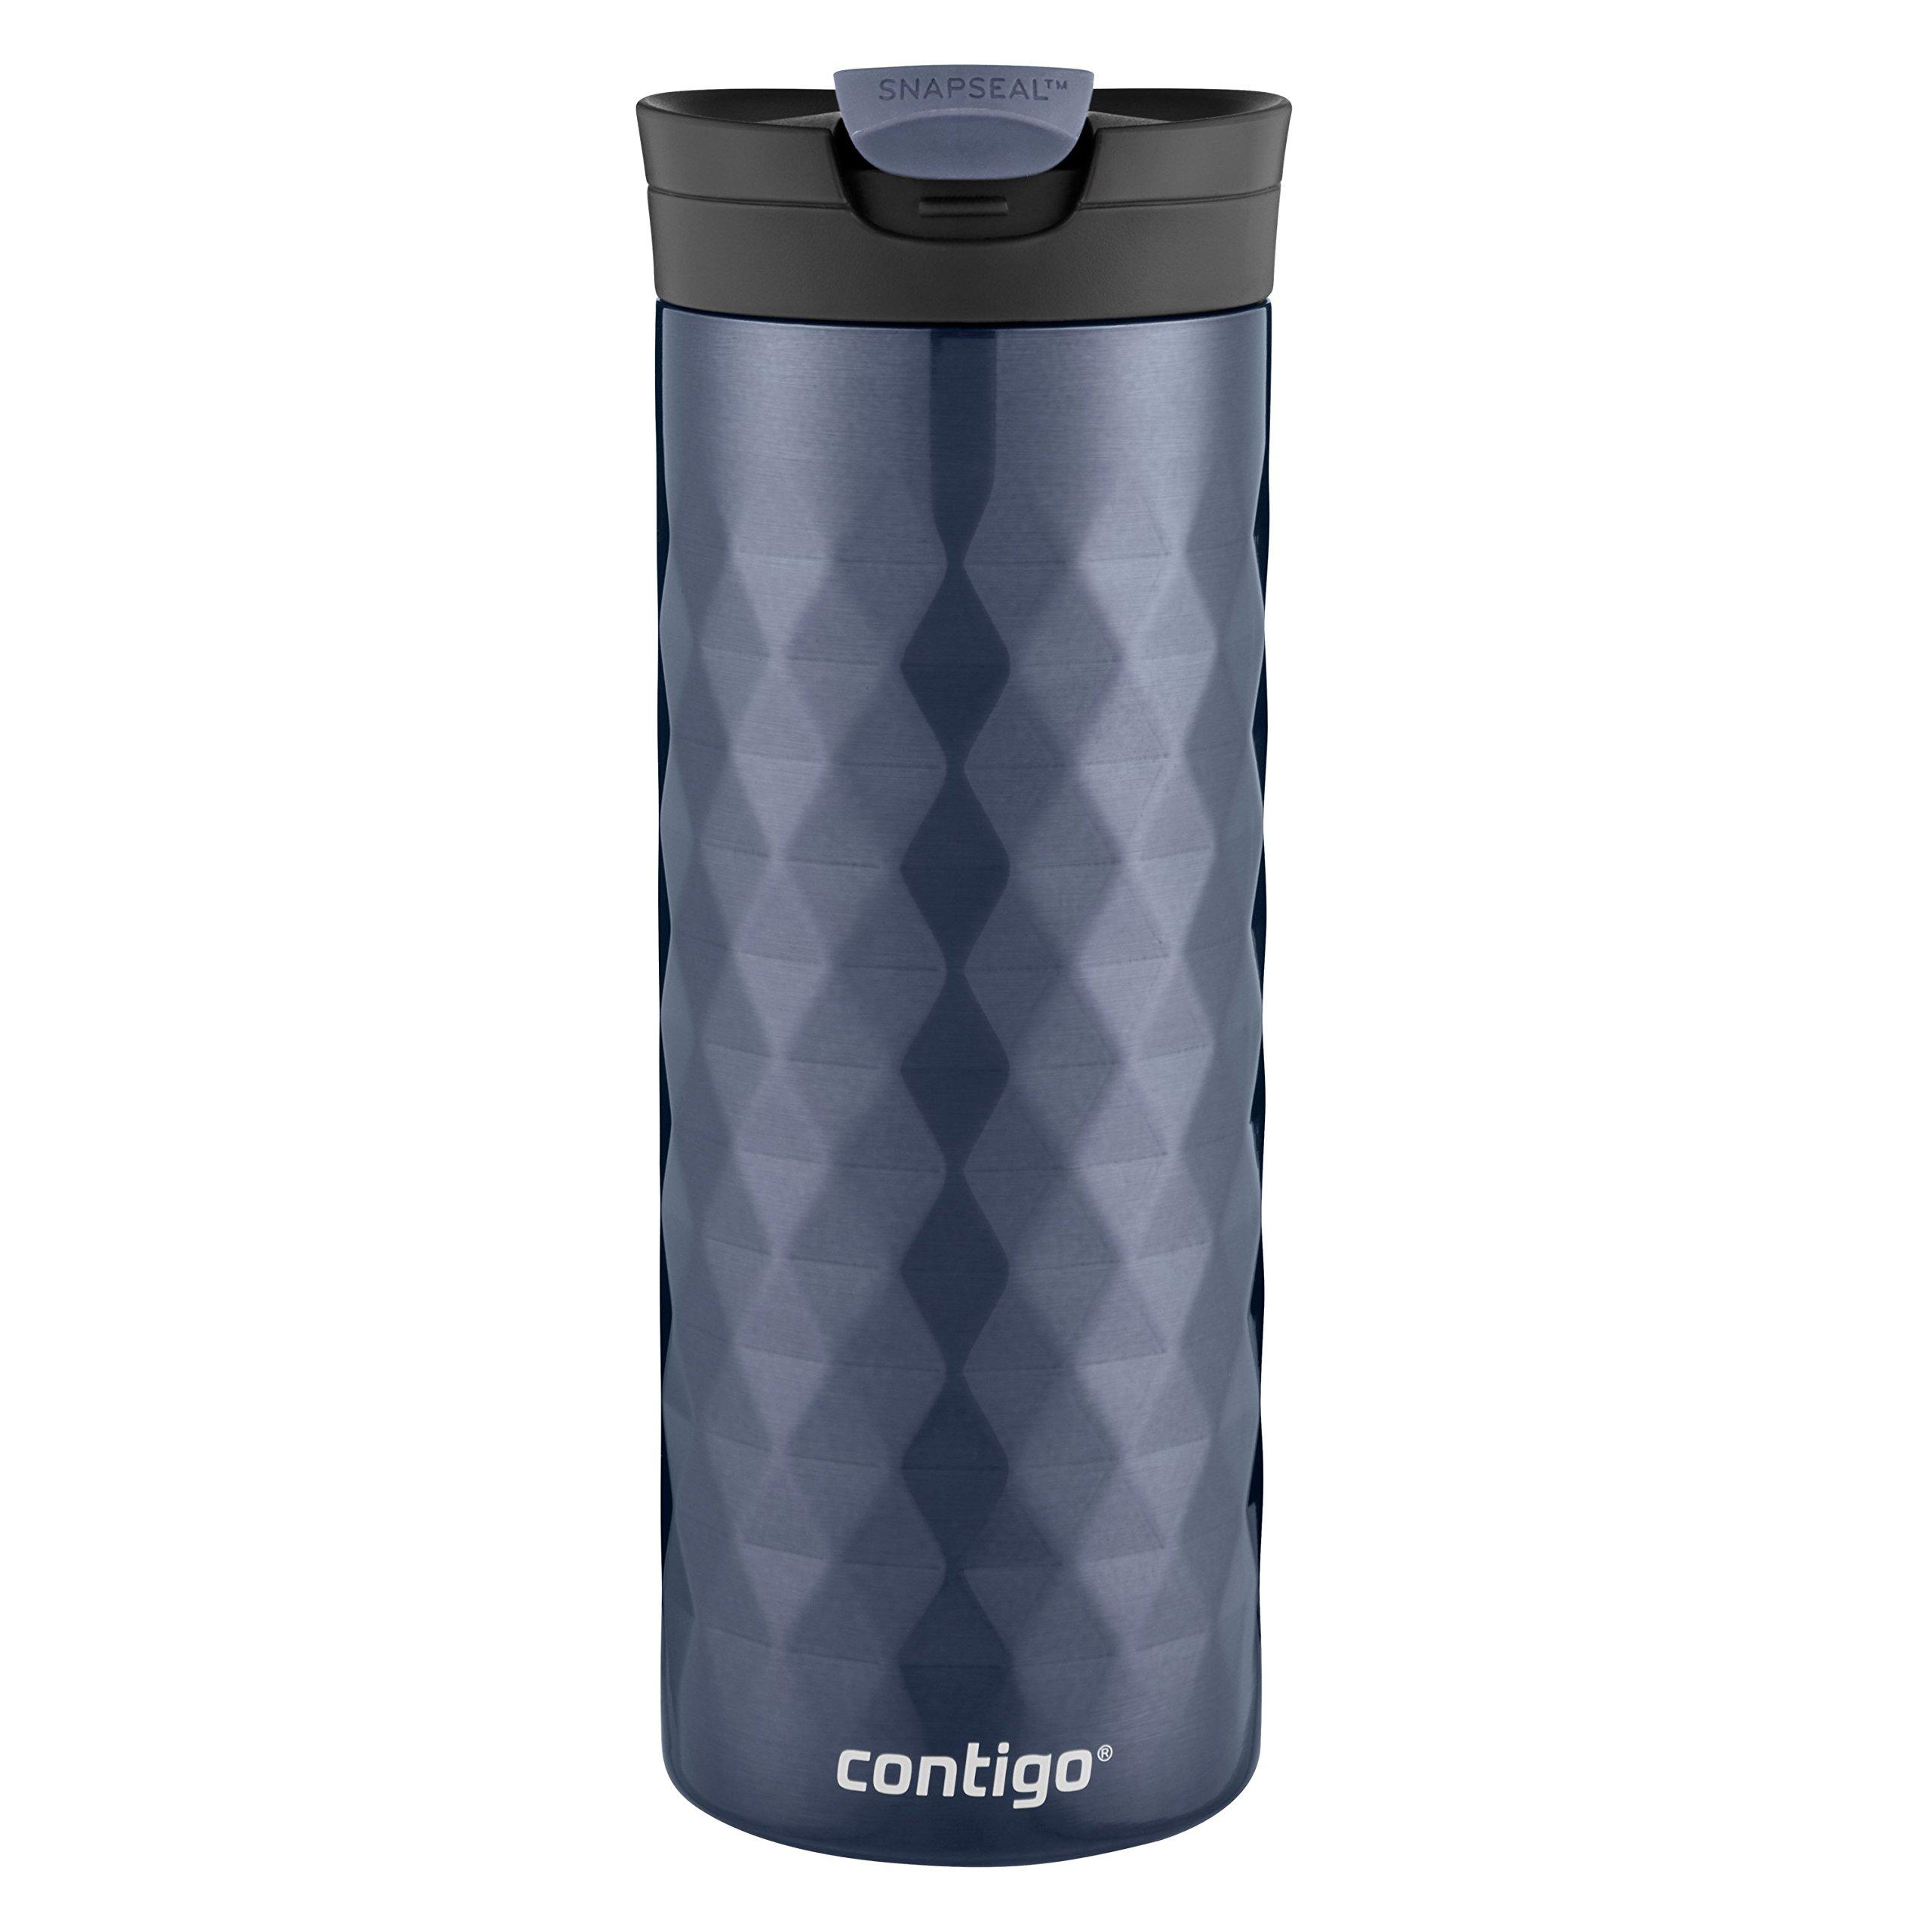 Contigo SnapSeal Kenton Stainless Steel Travel Mug, 20 oz, Serenity by Contigo (Image #2)